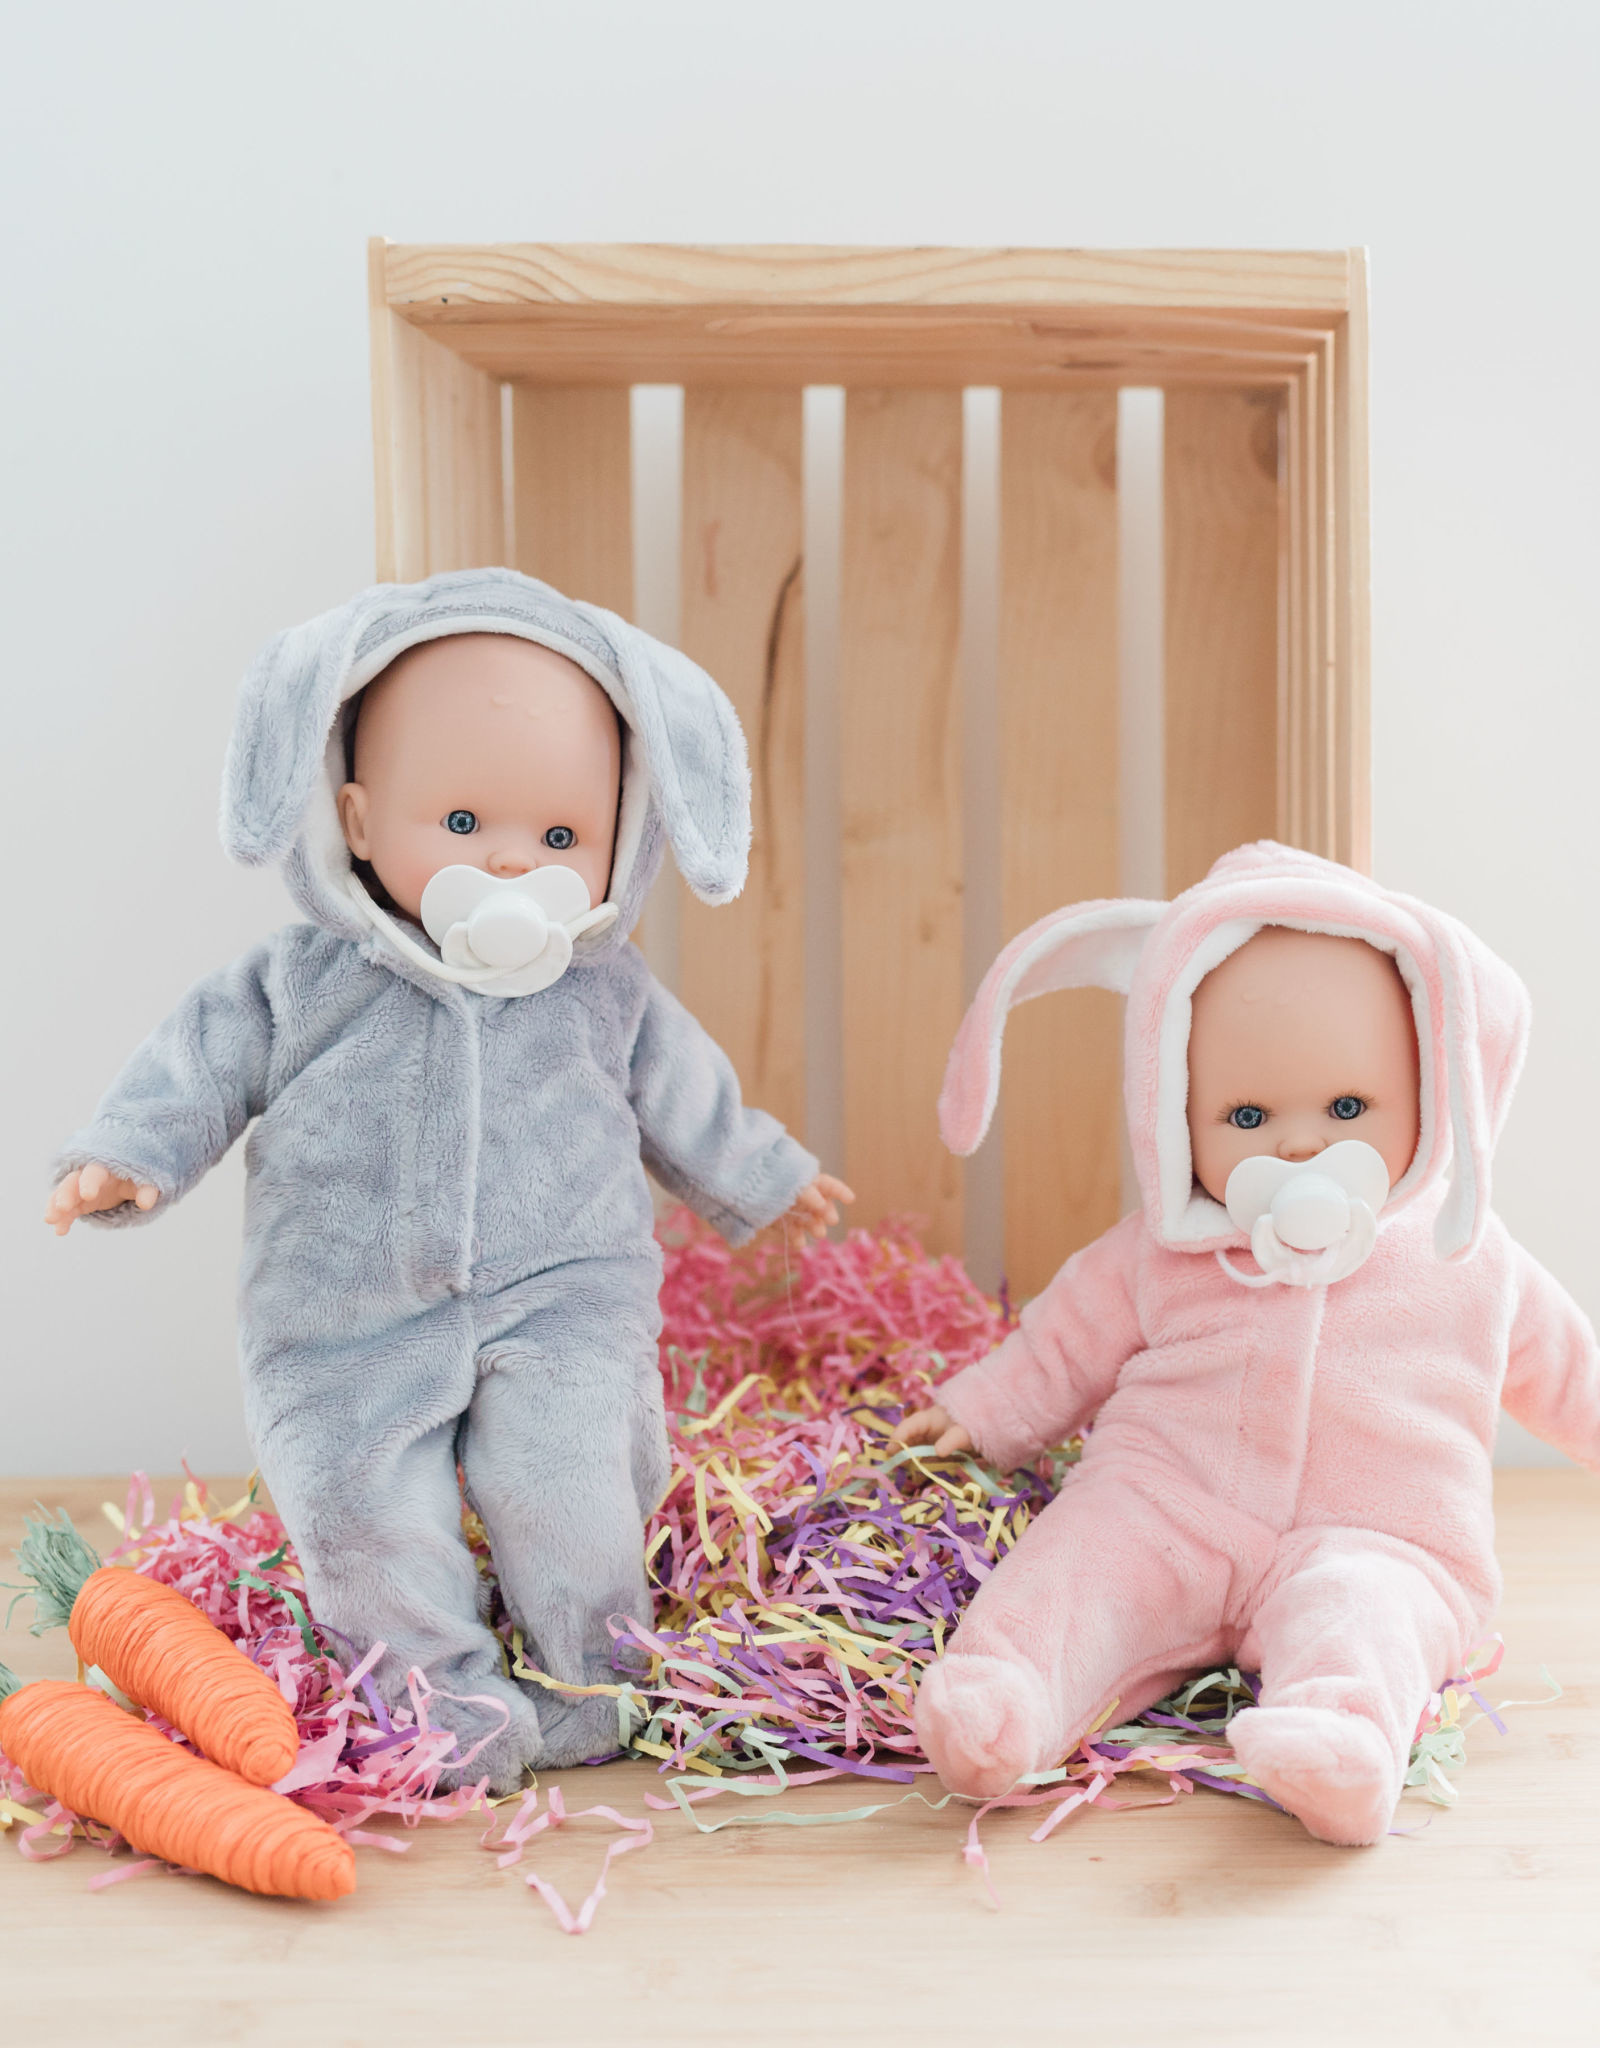 Paola Reina Alex & Sonia dol l- Sonia in pink rabbit pajamas